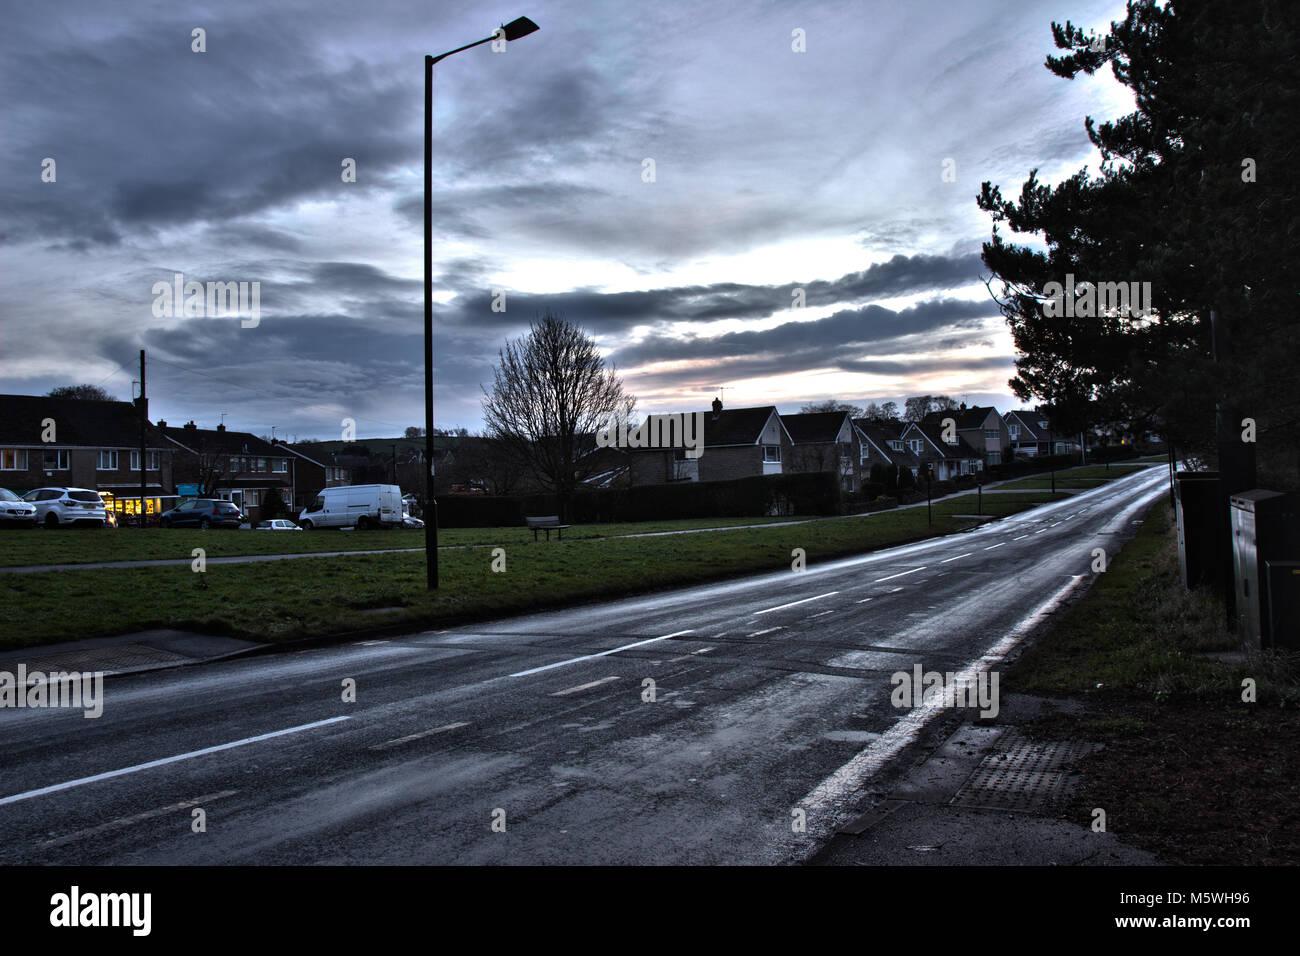 HDR Residential Street - Stock Image